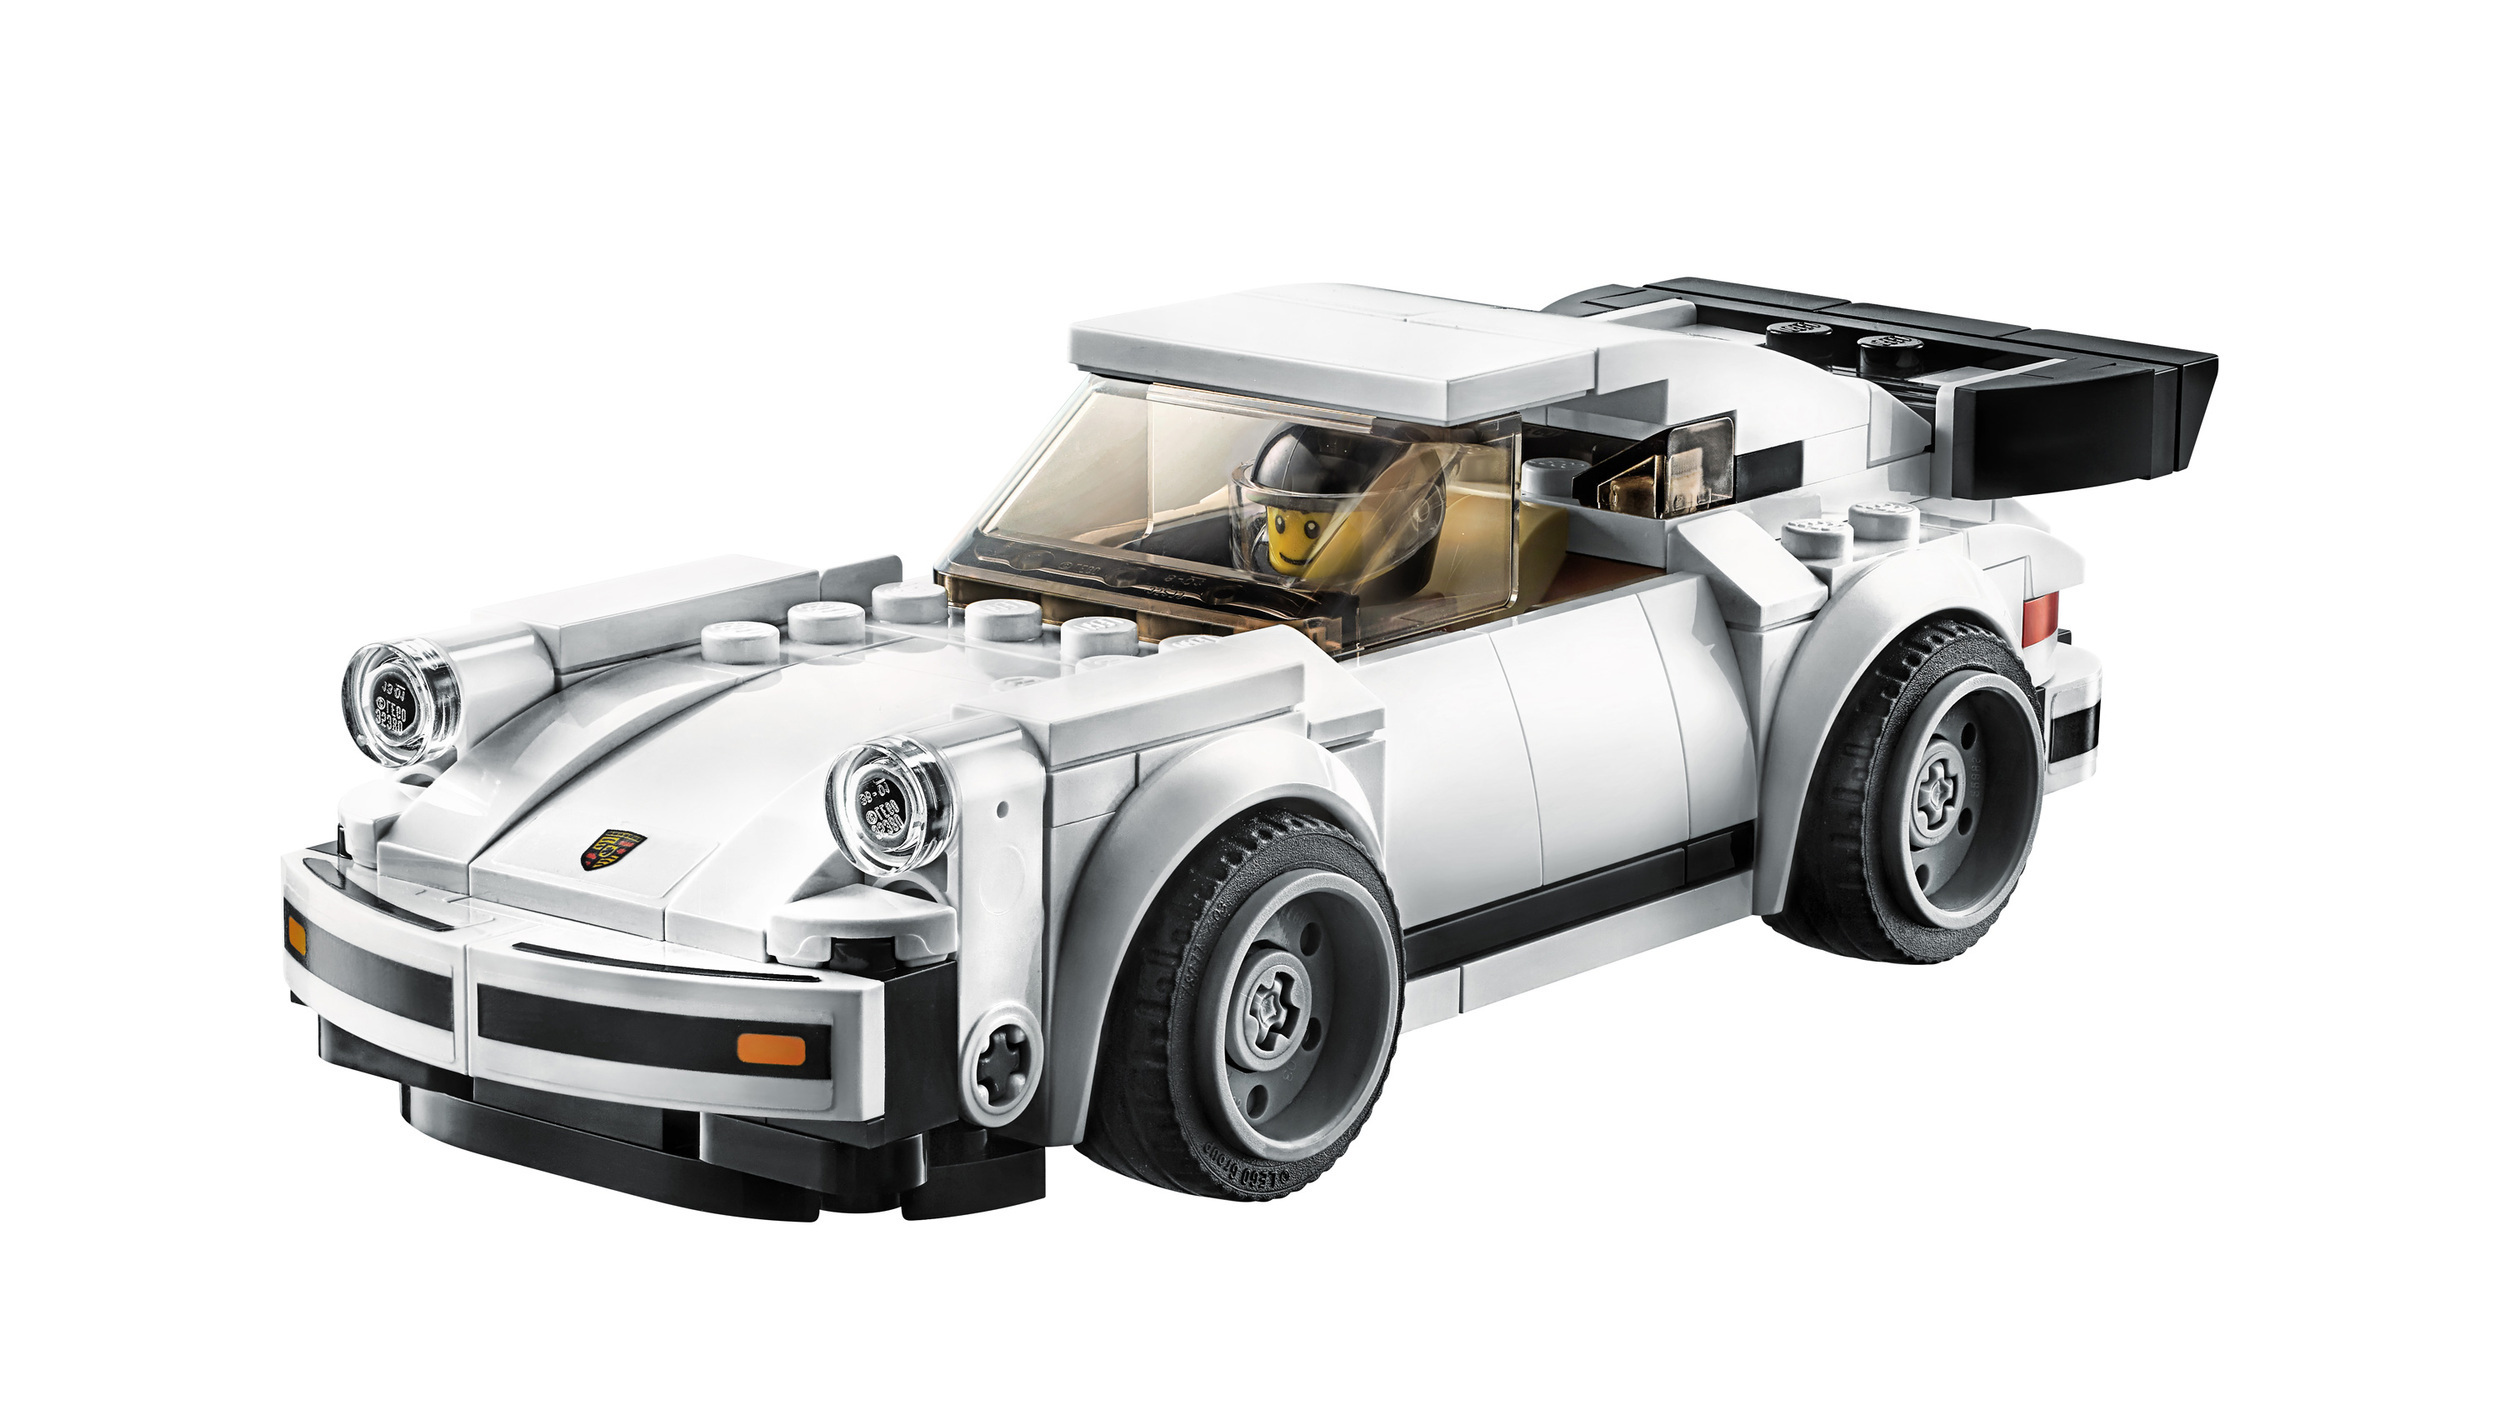 LEGO-Porsche-911-930-Turbo-1